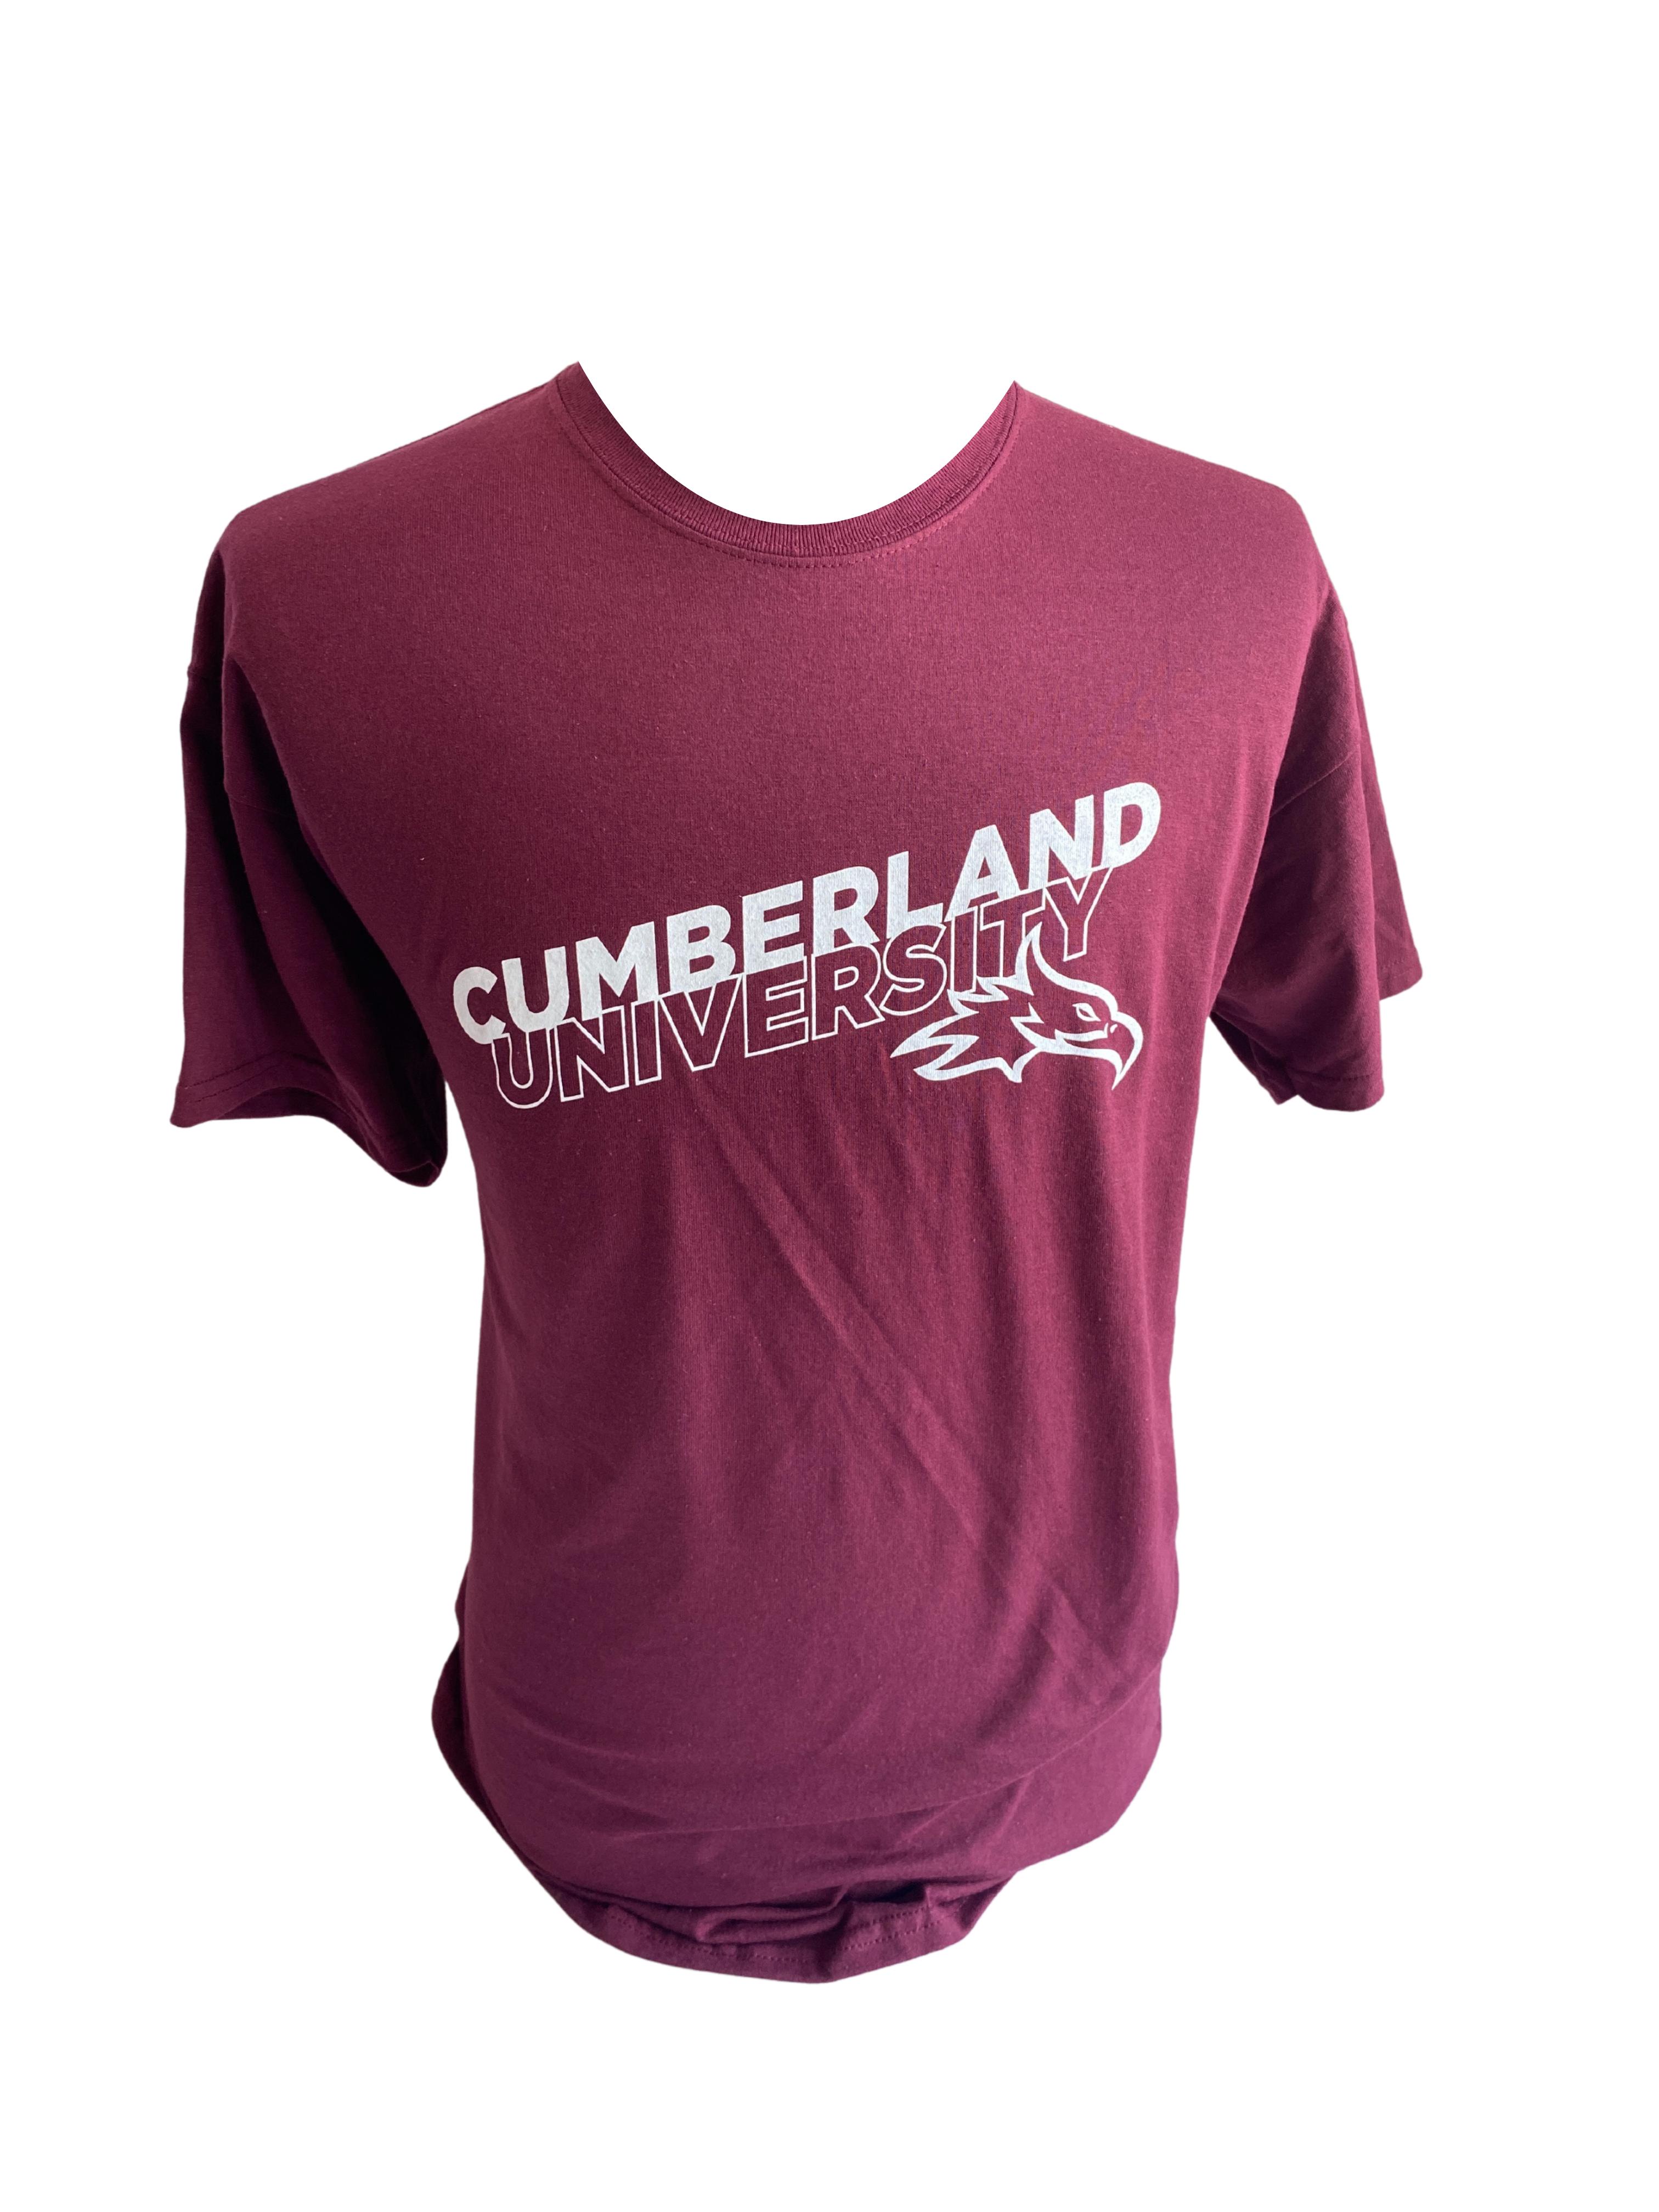 Cumberland University Phoenix Logo Tshirt